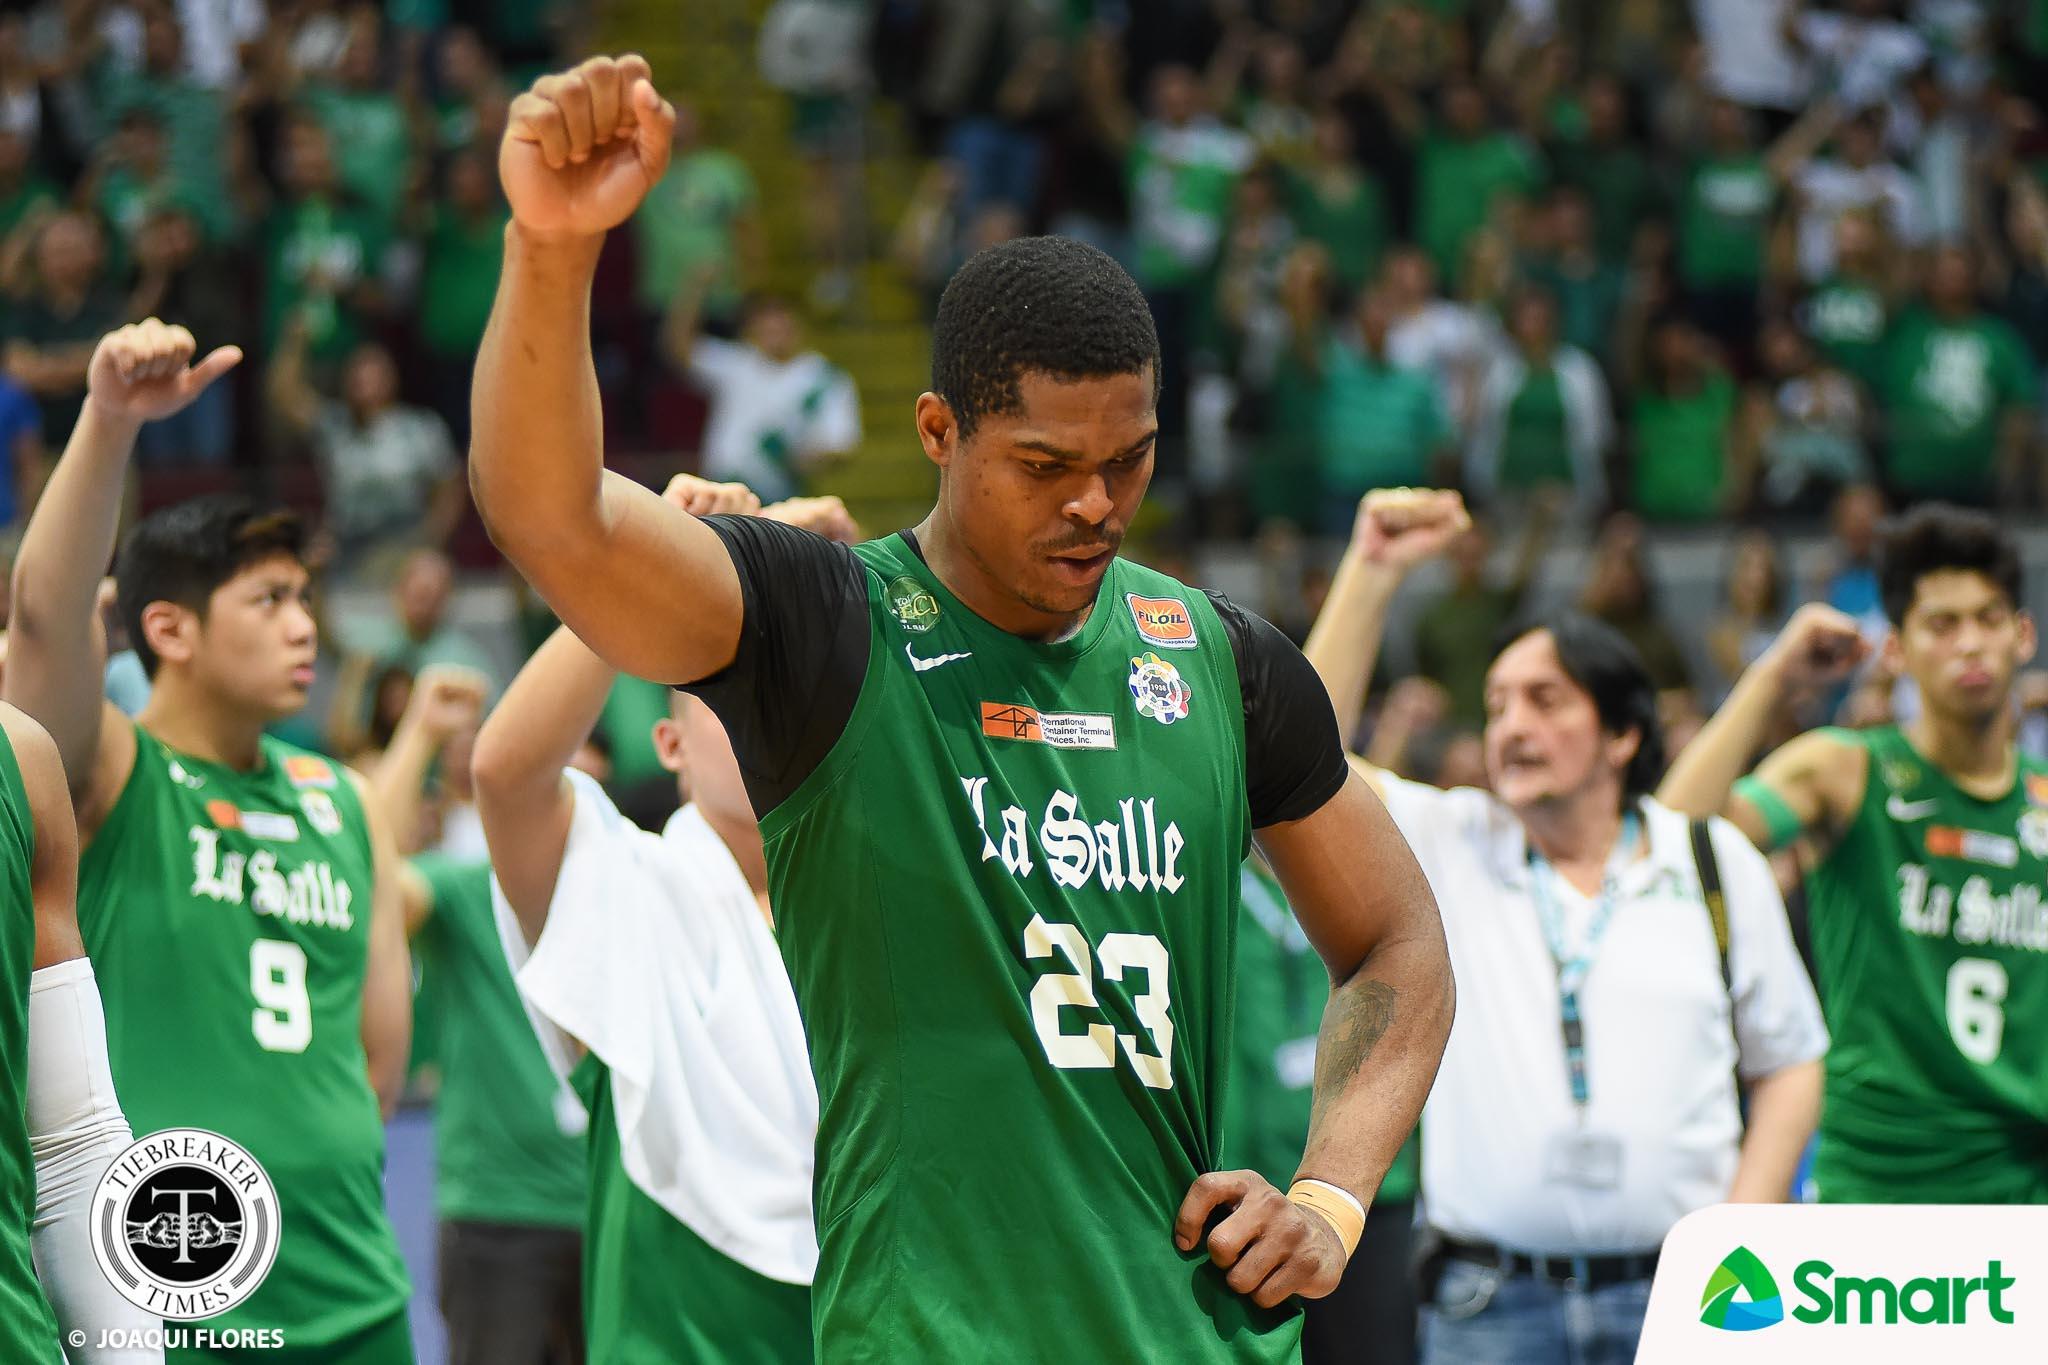 Philippine Sports News - Tiebreaker Times Ben Mbala bids La Salle farewell, turns pro Basketball DLSU News UAAP  UAAP Season 81 Men's Basketball UAAP Season 81 DLSU Men's Basketball Ben Mbala